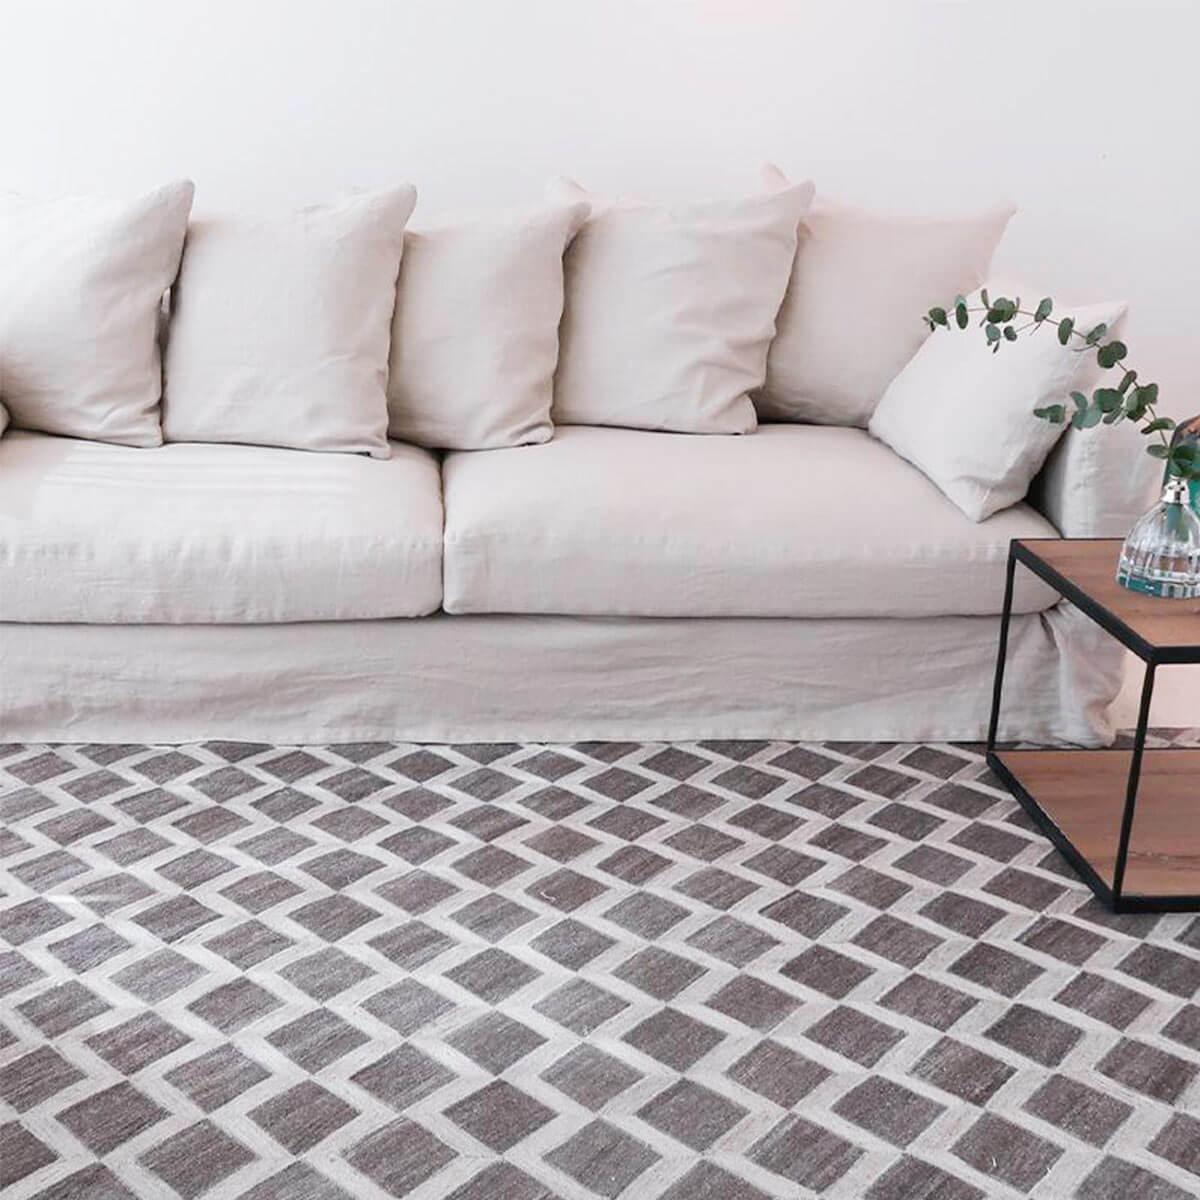 Belgian-3-Seater-Linen-Sofa-in-Natural